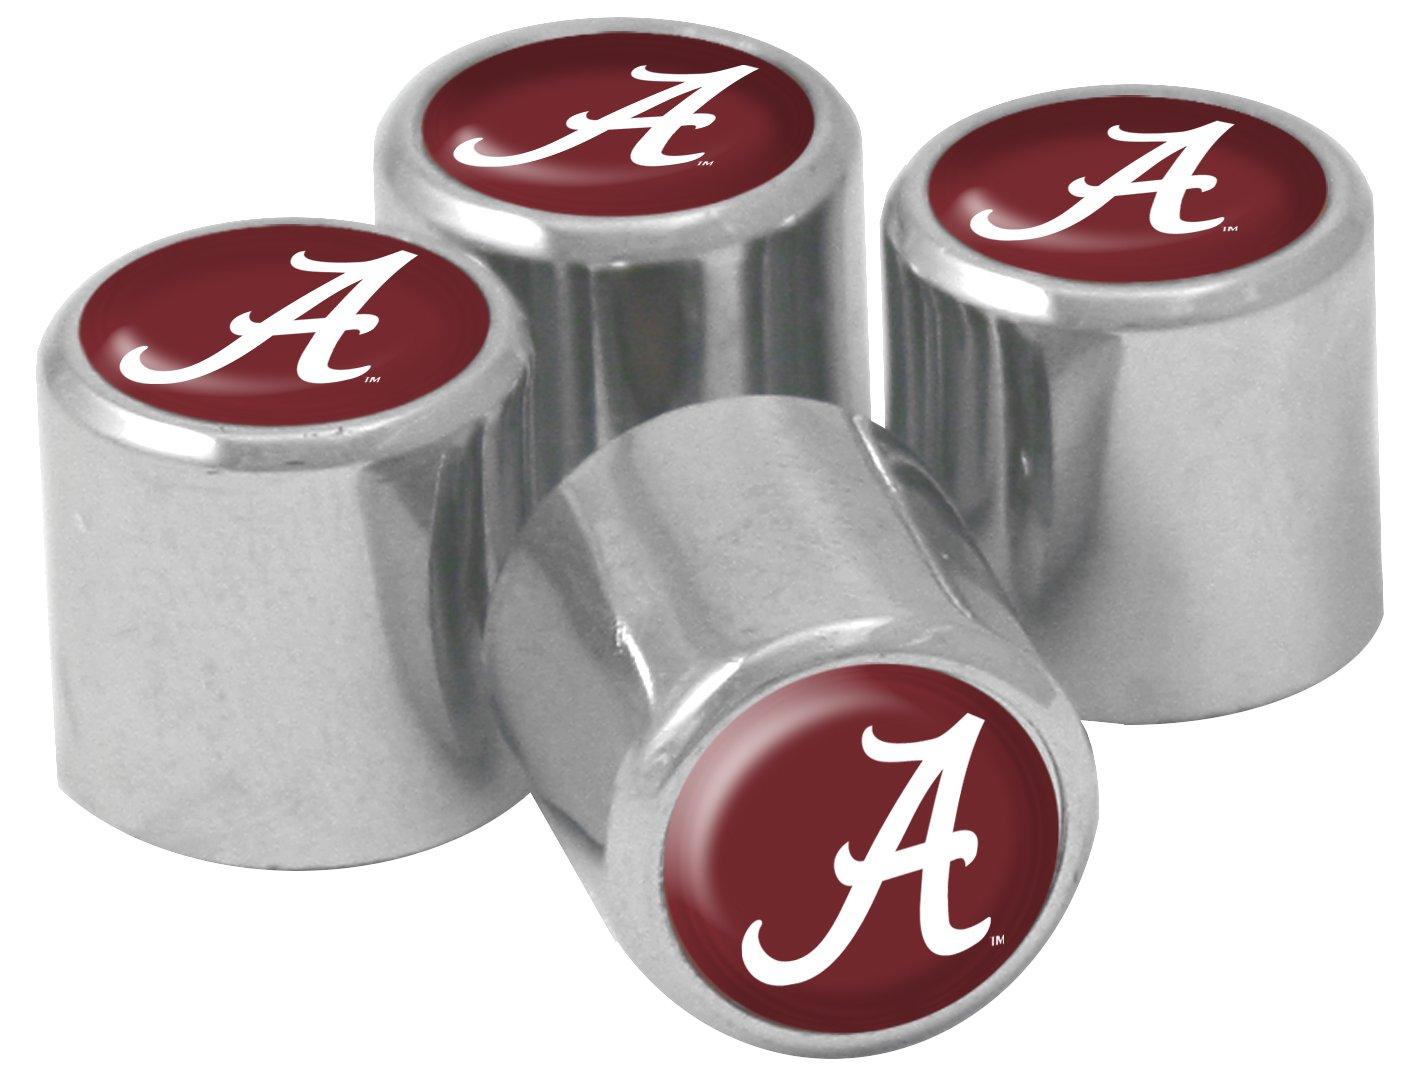 NCAA Alabama Crimson Tide Metal Tire Valve Stem Caps, 4-Pack